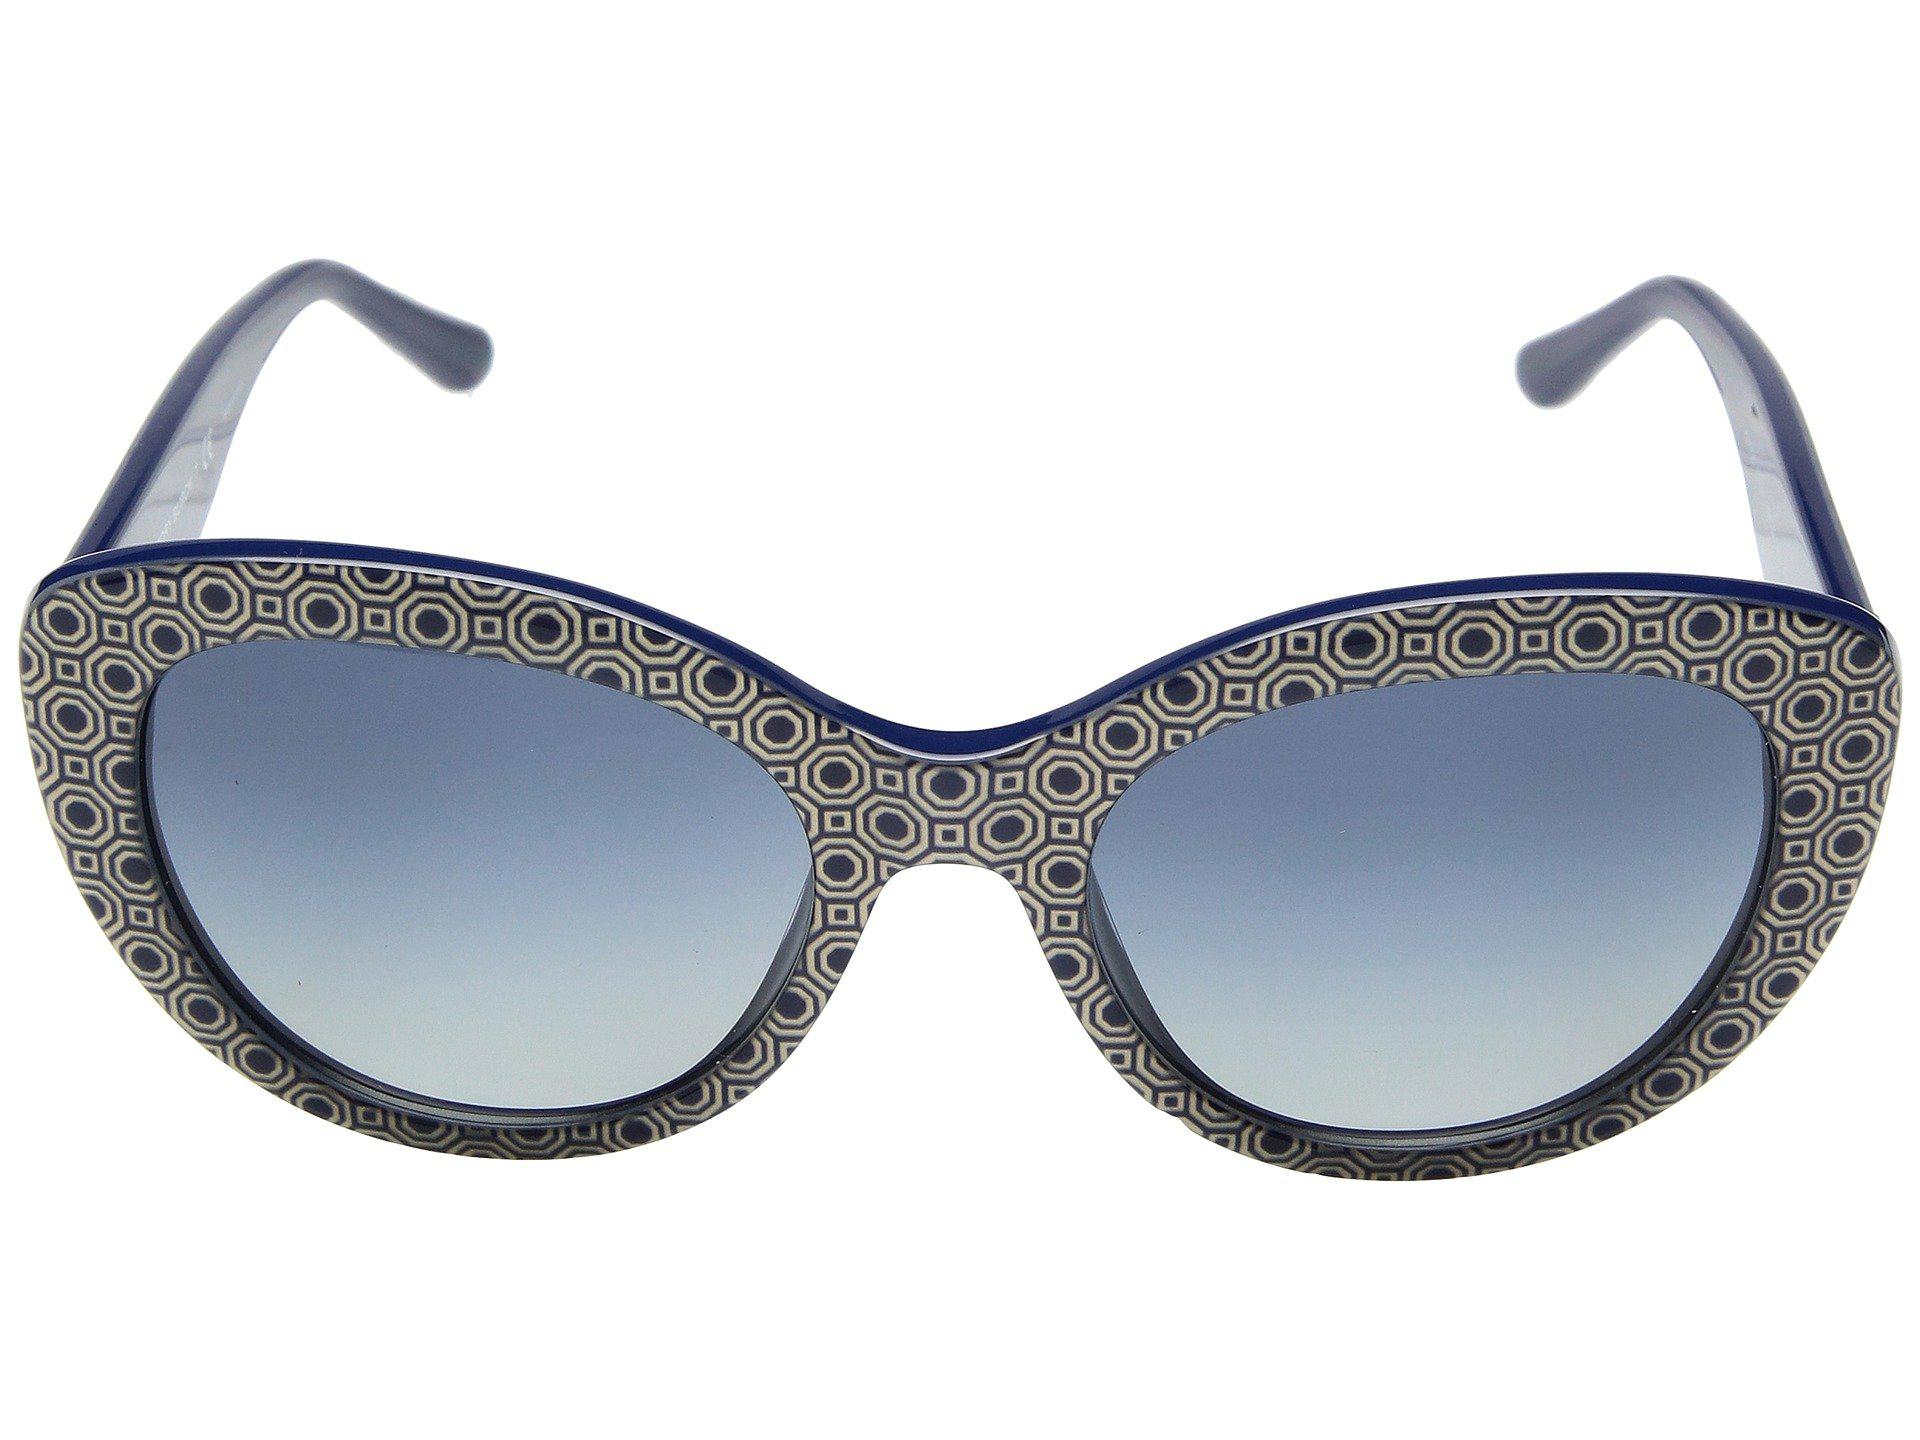 ea4987fdffa6 Tory Burch 0ty7121 55mm (black/grey Gradient) Fashion Sunglasses - Lyst